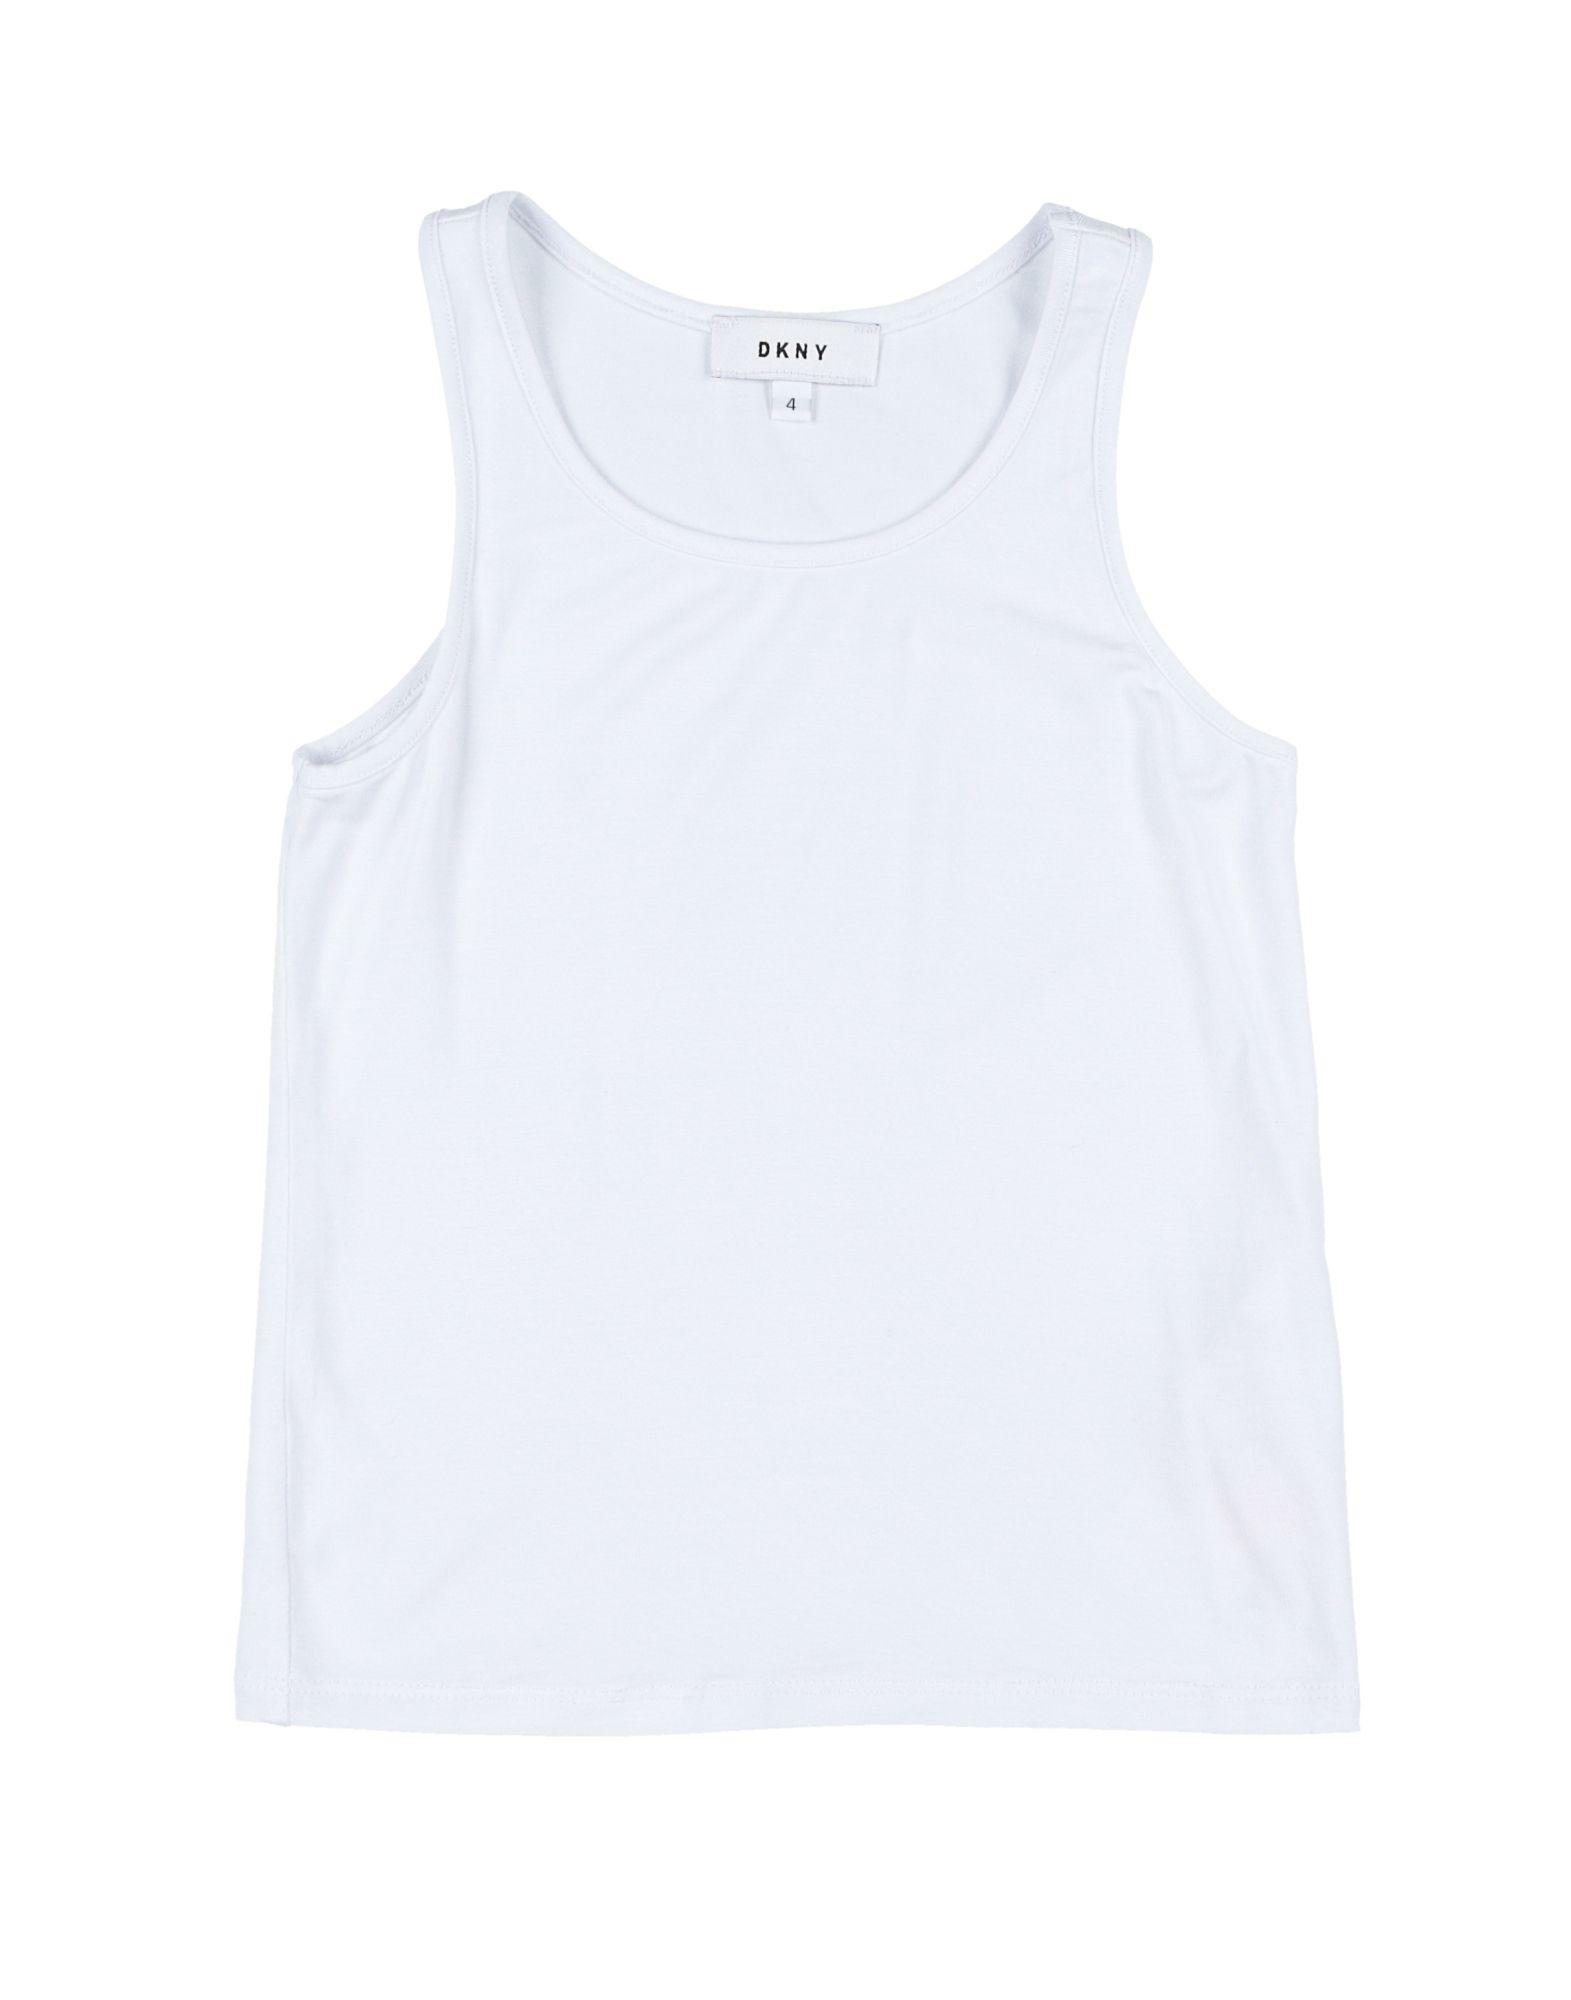 1571x2000 Dkny T Shirt Girl 3 8 Years Online On Yoox Denmark